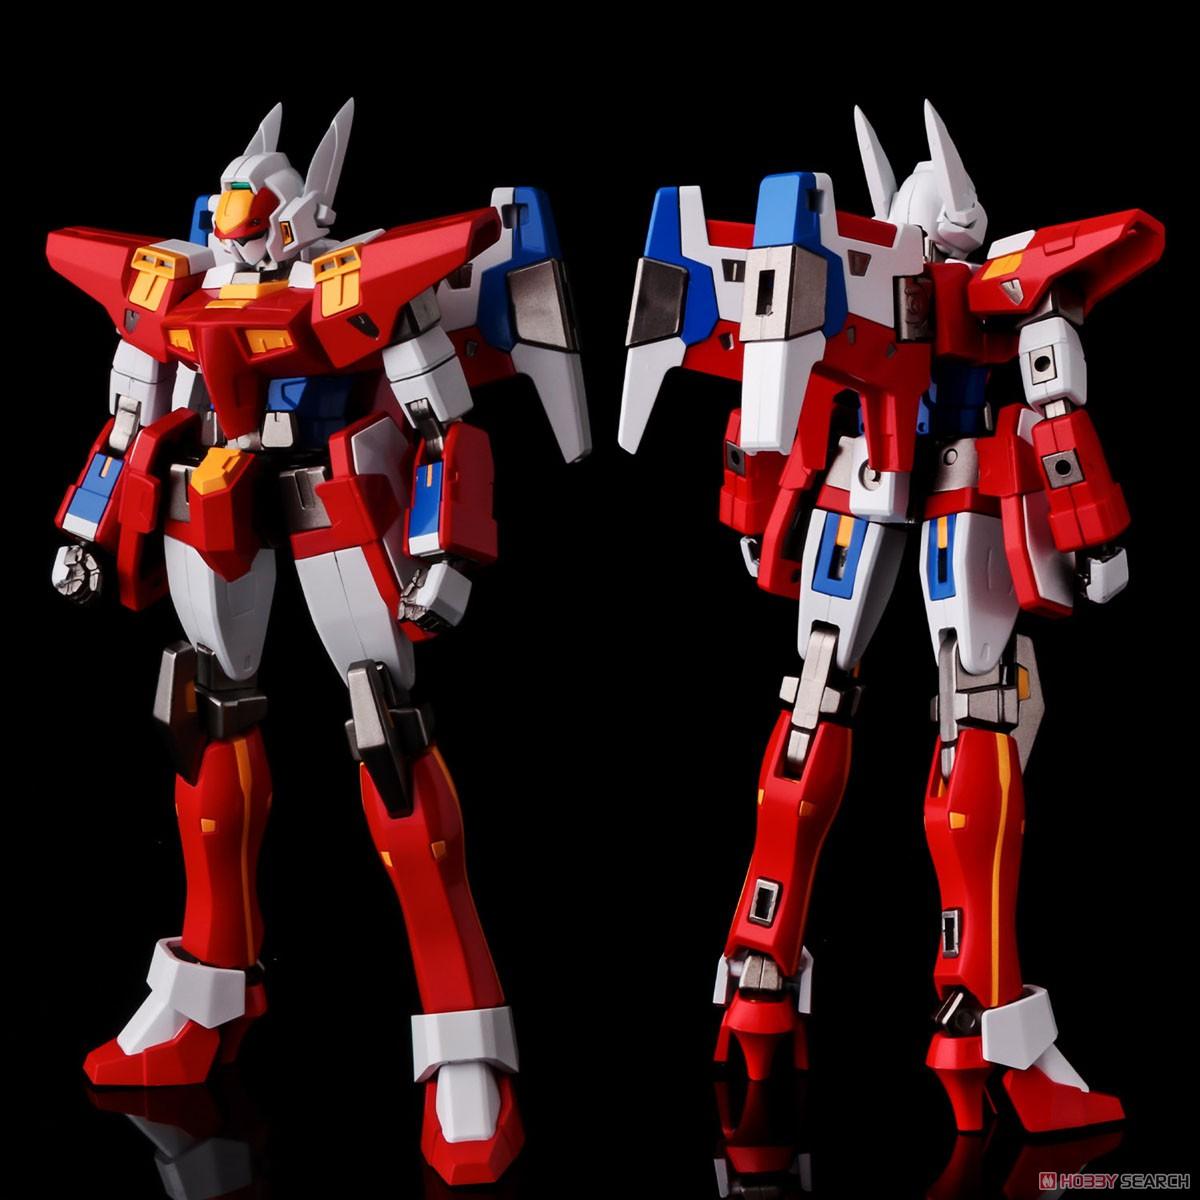 RIOBOT『変形合体 R-1』スーパーロボット大戦OG 可変合体フィギュア-037